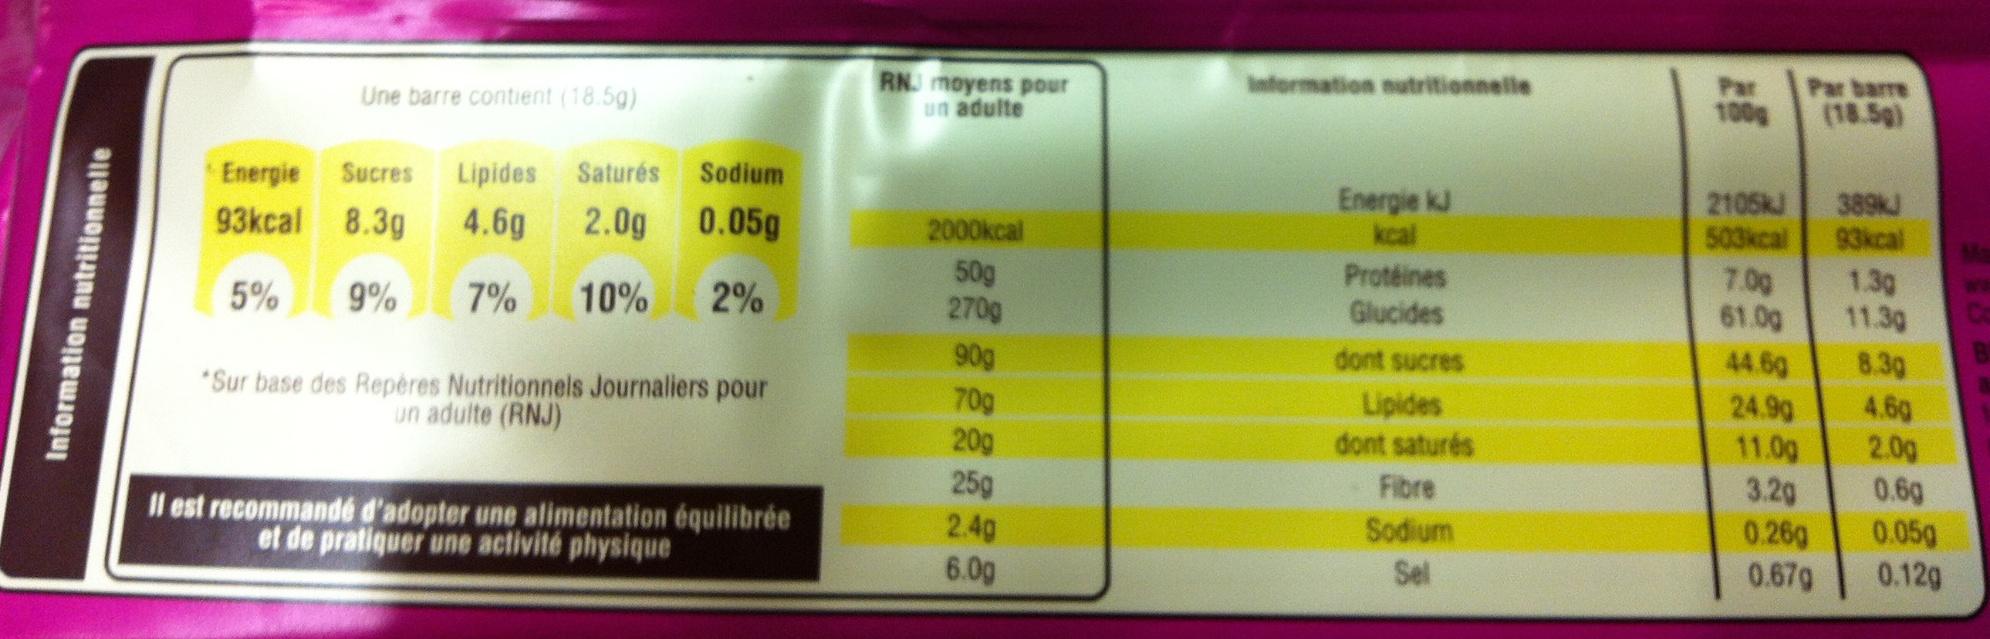 Balisto fruits des bois - Nutrition facts